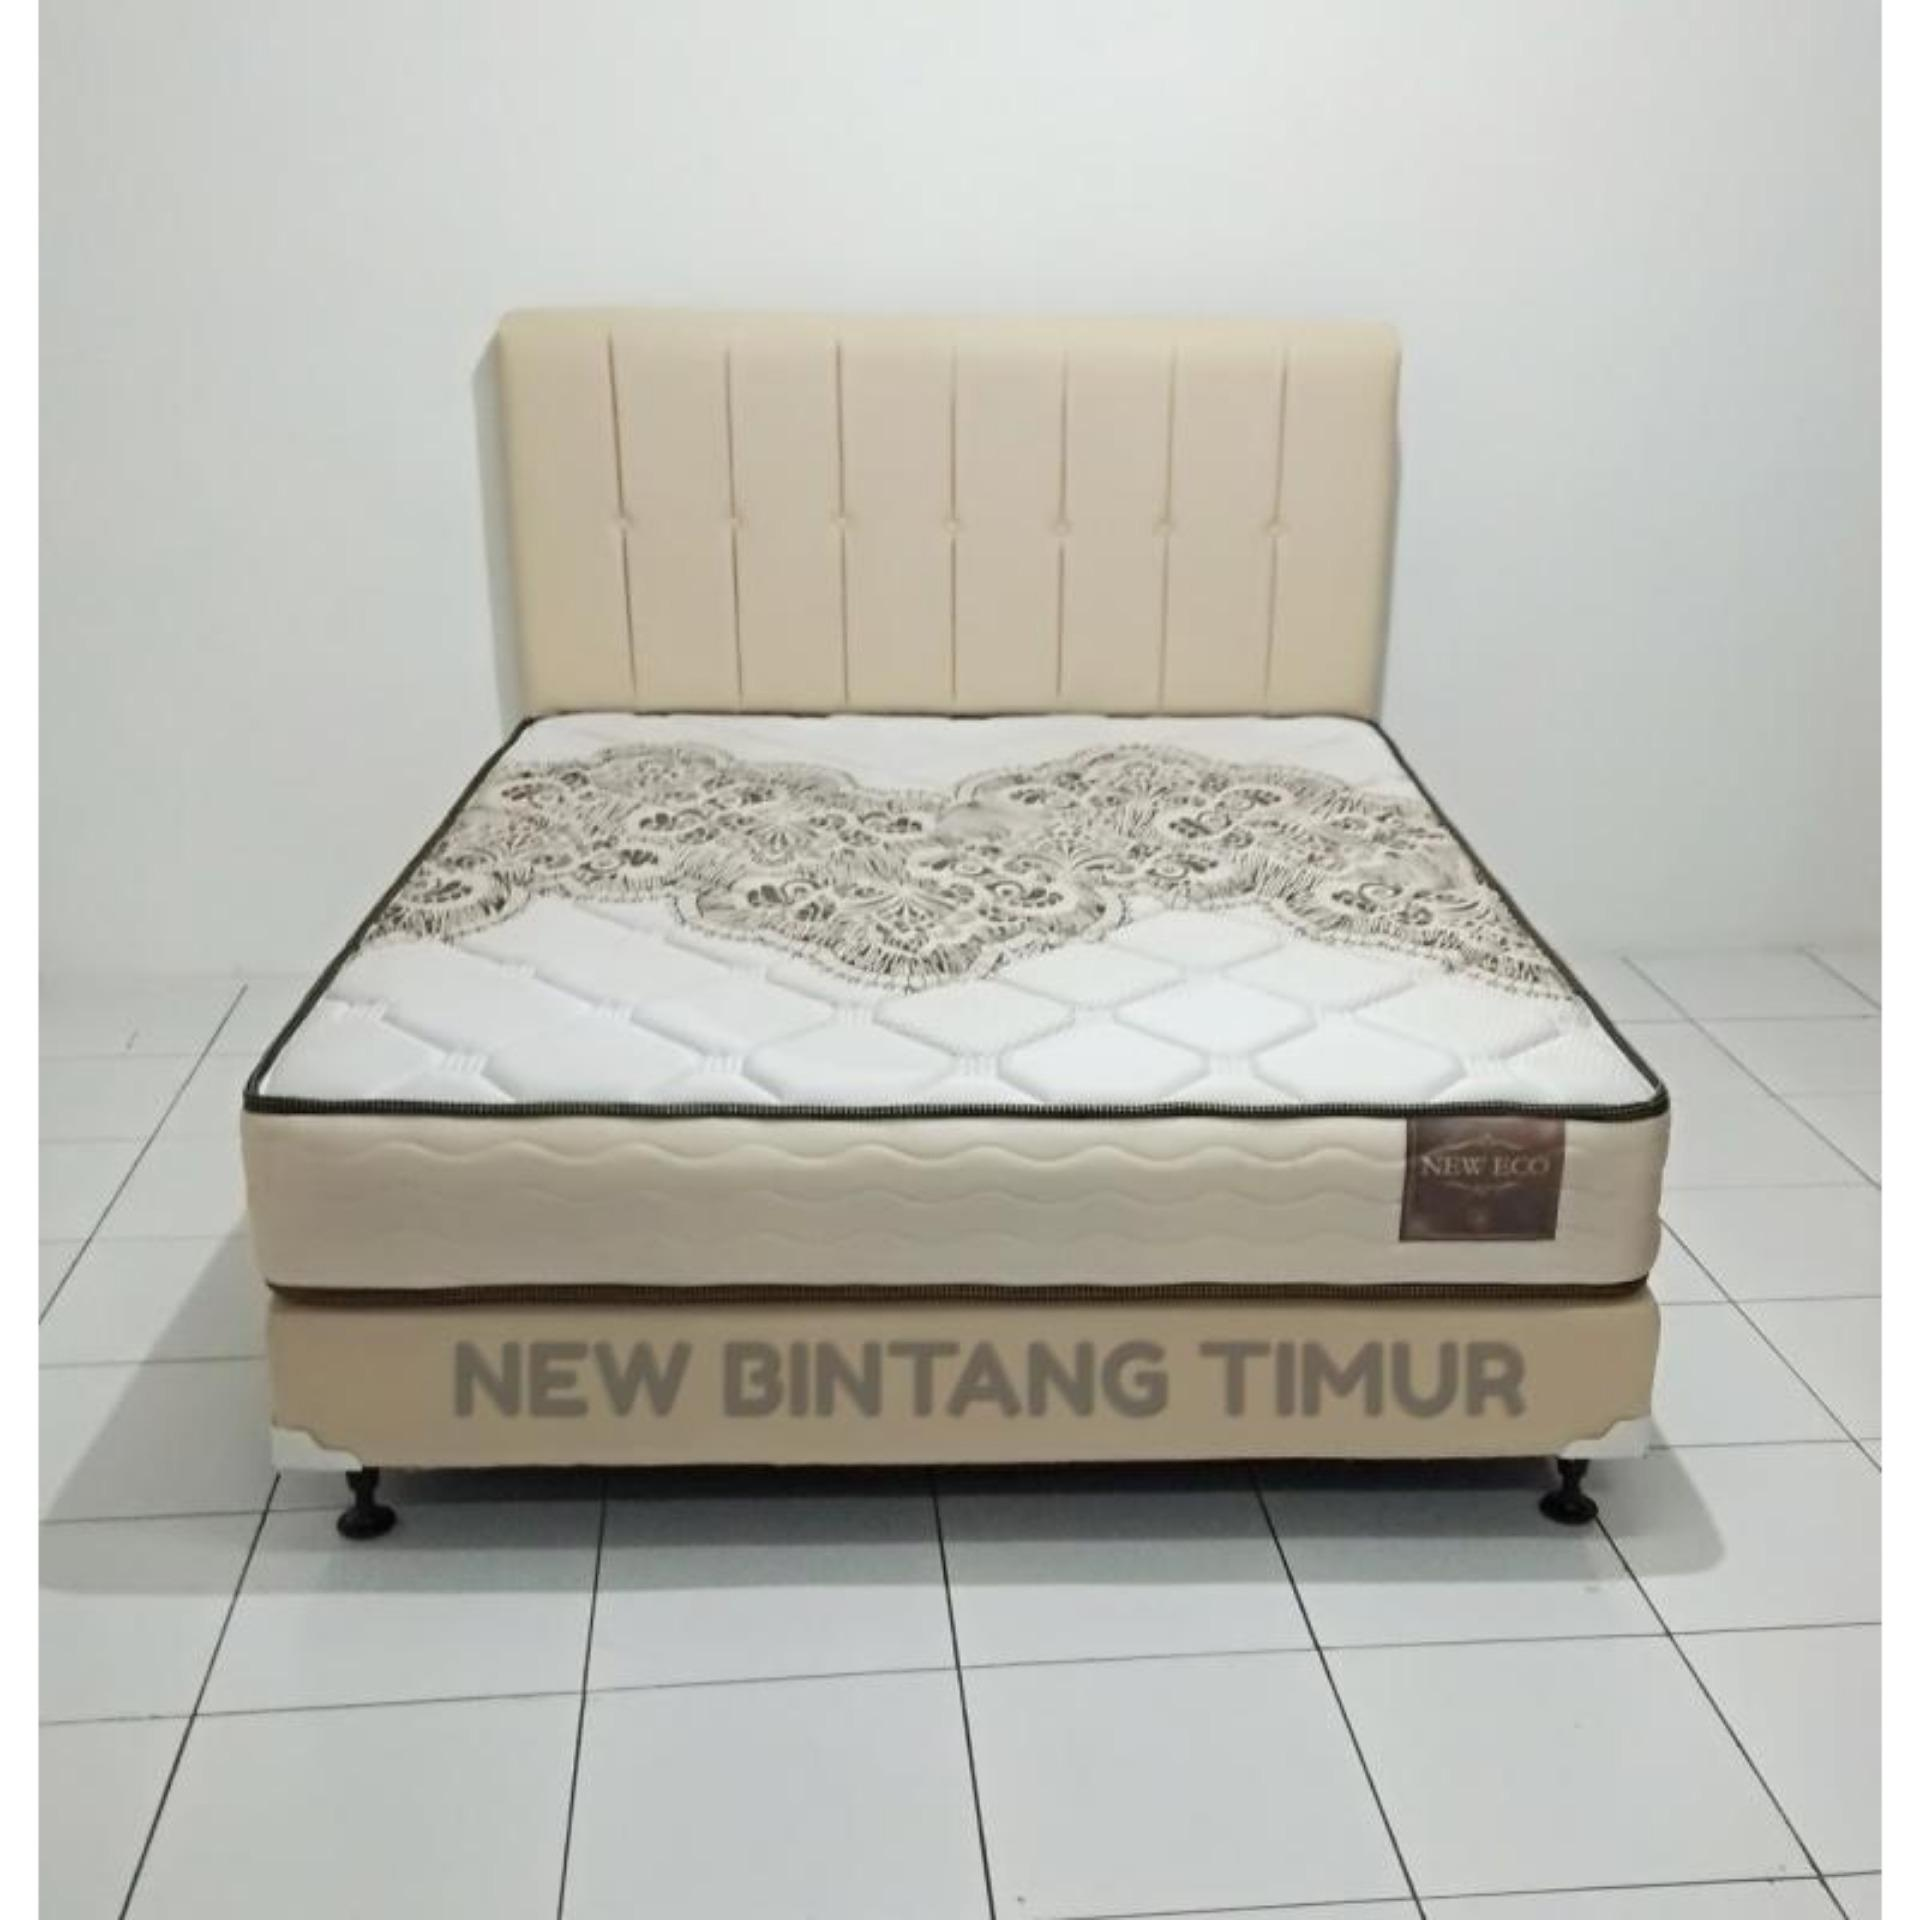 Resta Spring Bed Set By Airland Elbe 180x200x25 Cm Krem Gratis 2 Fcenter Matras Platinum Plushtop 180x200 Hanya Kasur Jawa Tengah Diy Timur New Eco 160 X 200 Hb Romeo Full